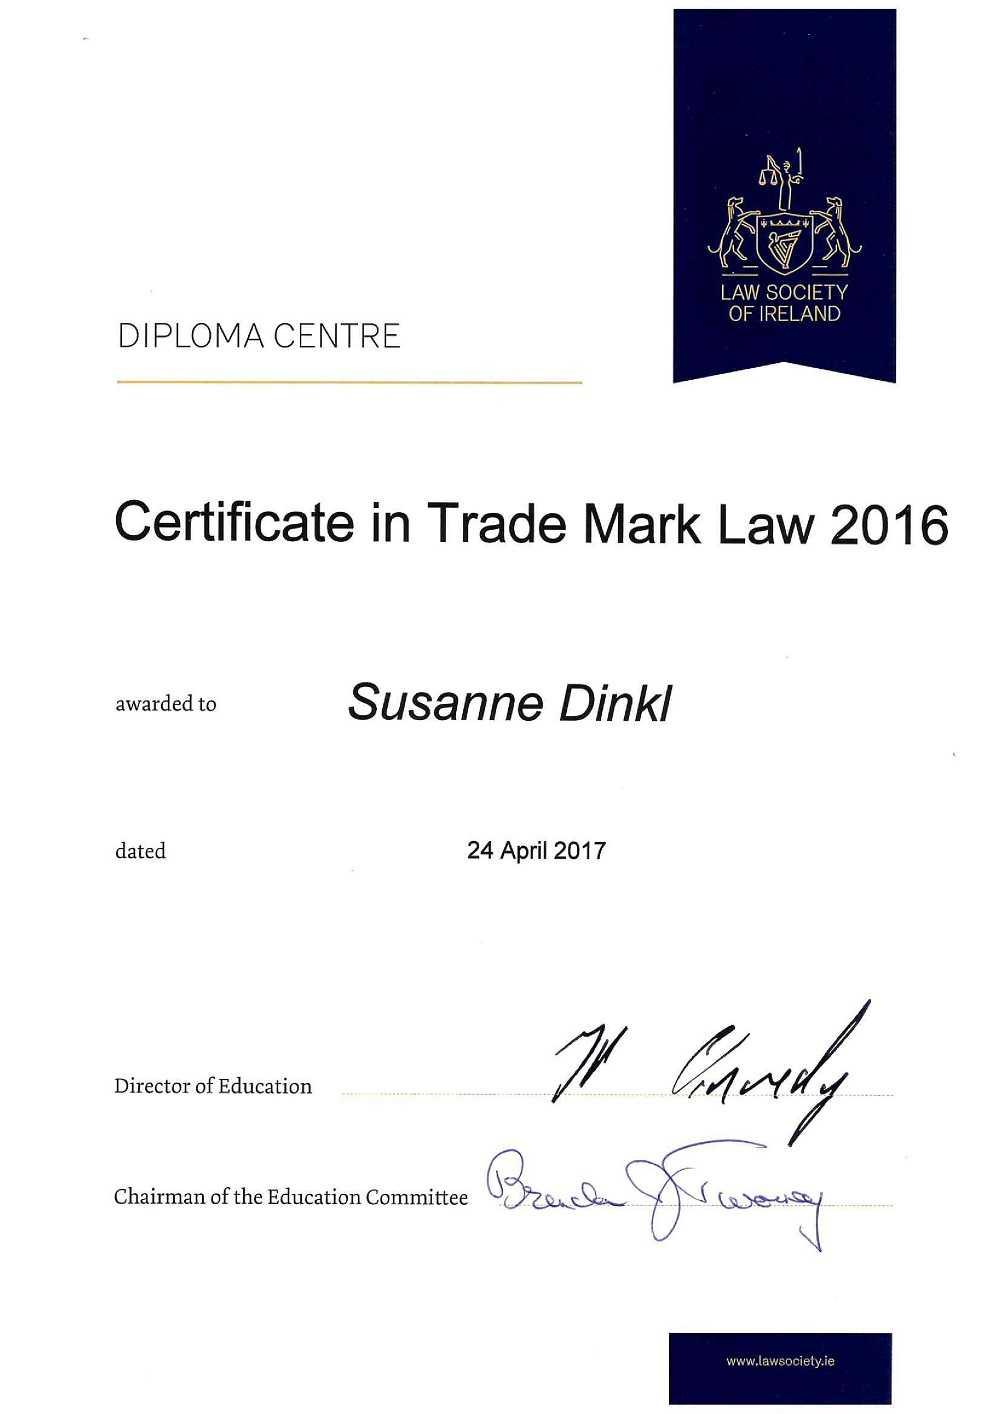 Susanne-Dinkl-Diploma